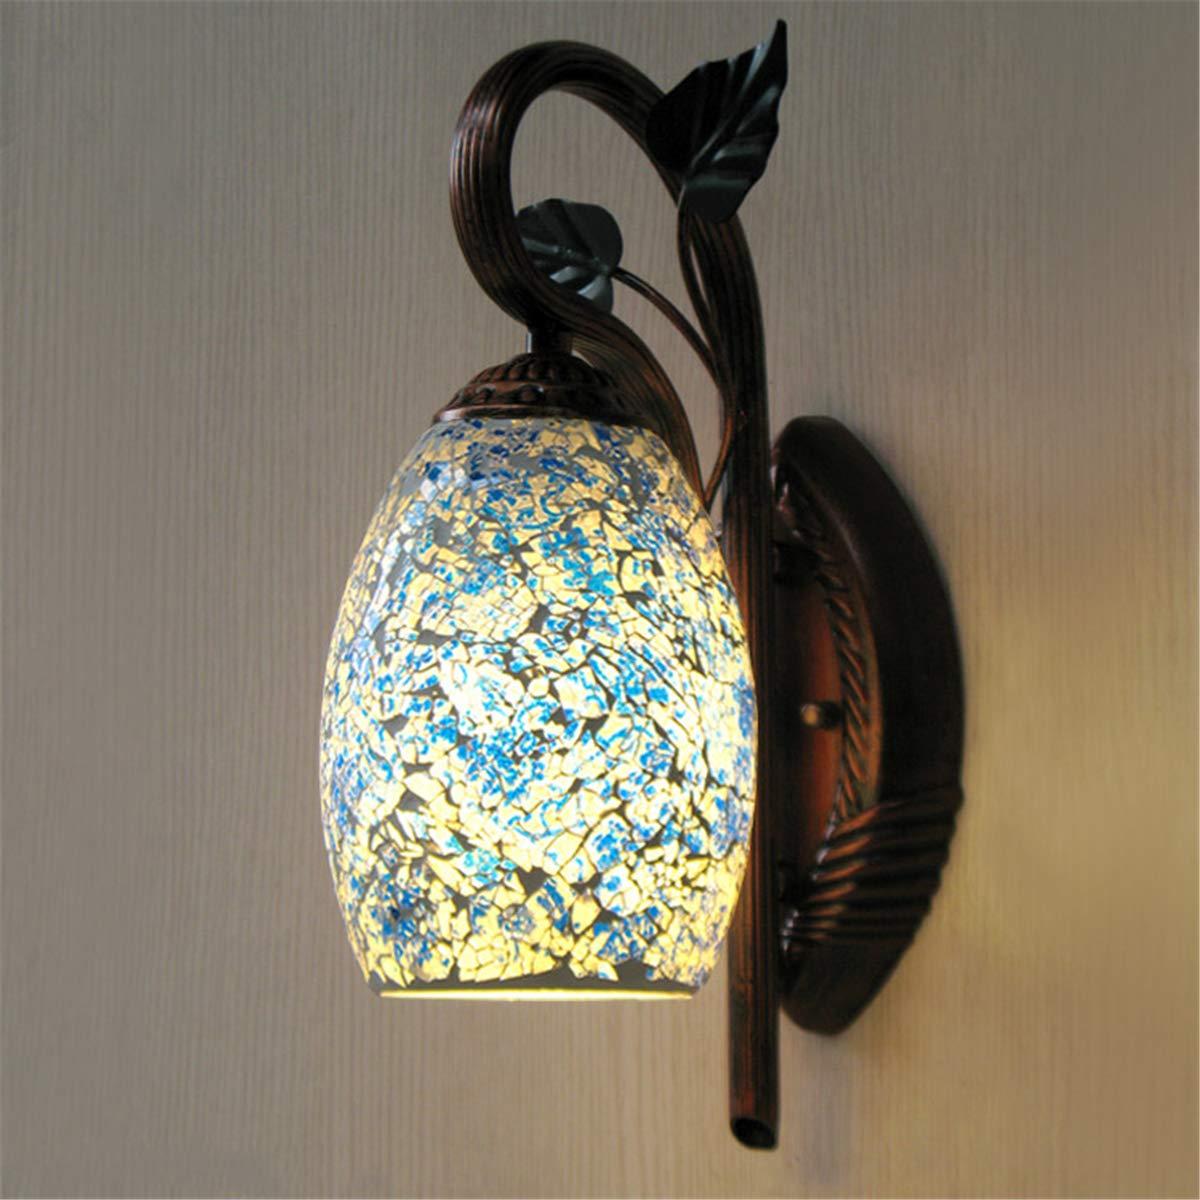 L&U Chinesische Retro kreative Wandlampe, roter BronzelampenKörper, Blauer Glaslampenschirm, einfache Korridor-Treppengangschlafzimmernachtwandwand Blaue und weiße Porzellanglaswandlampe